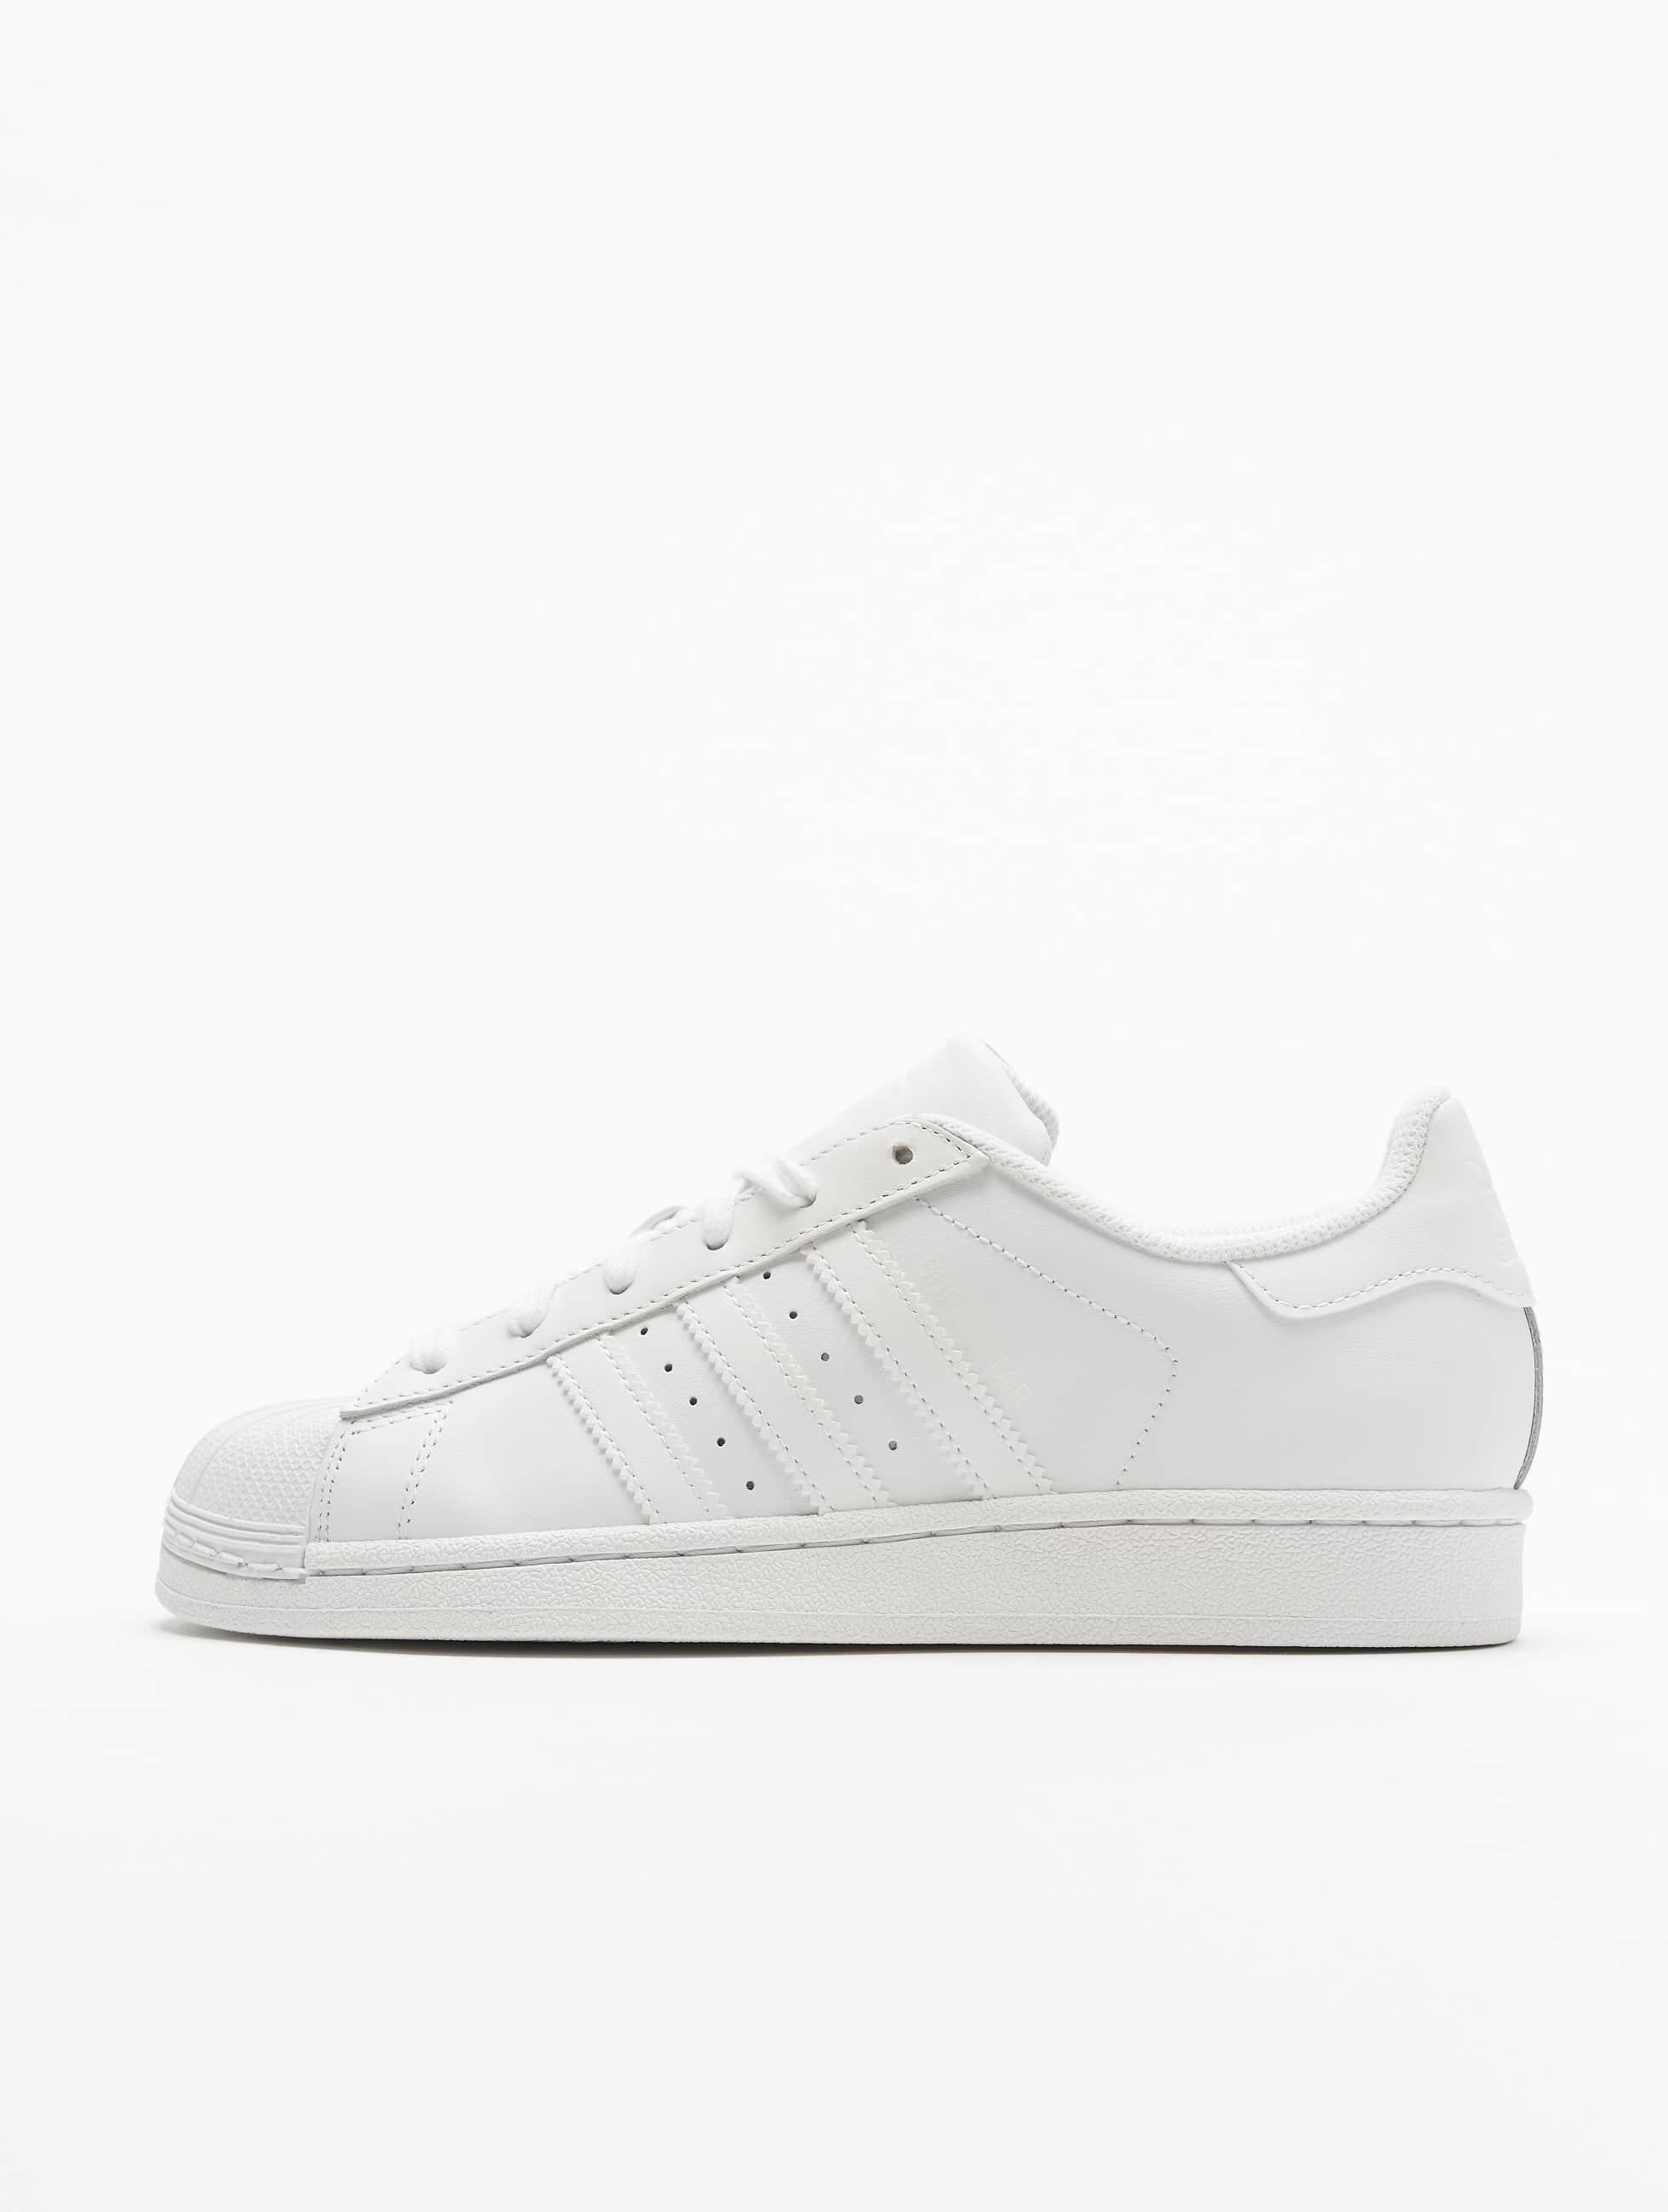 adidas Sneakers Superstar Founda white